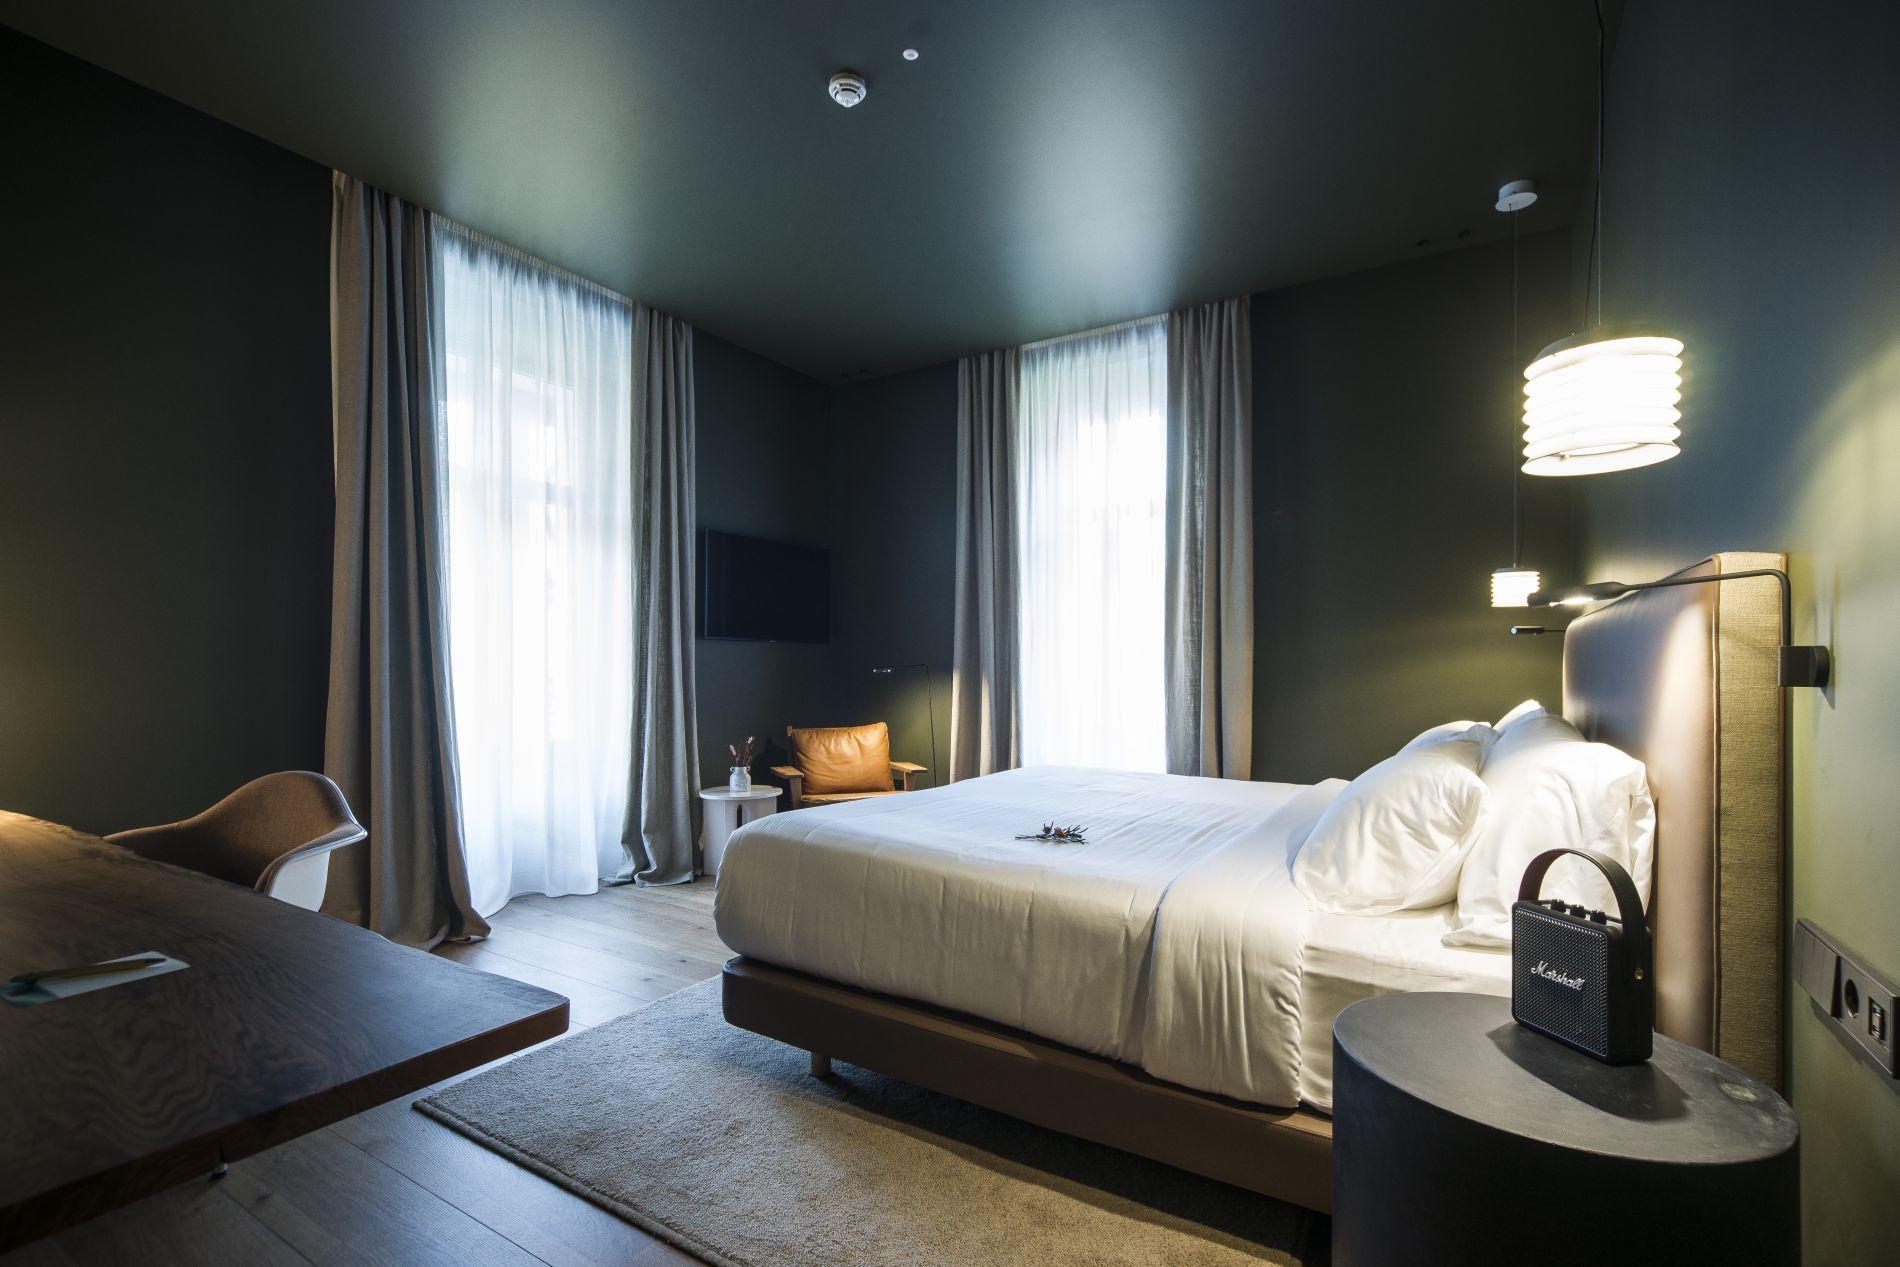 Fiark - Hotel Arbaso 65